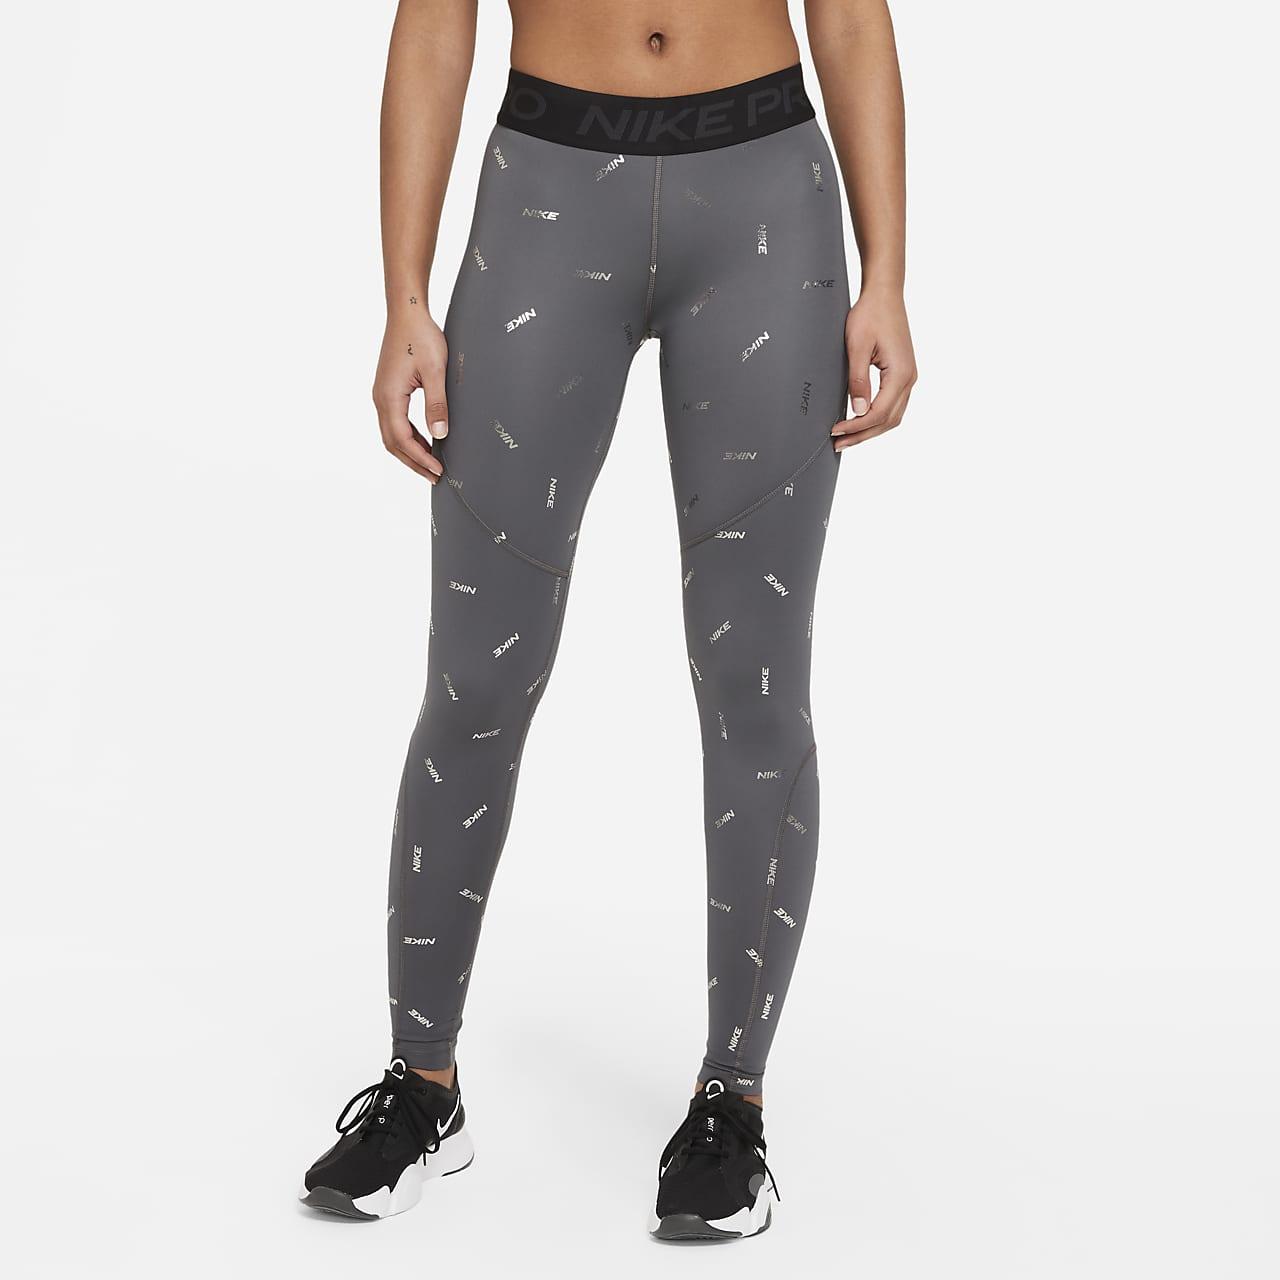 Nike Pro Women's Printed Tights. Nike.com